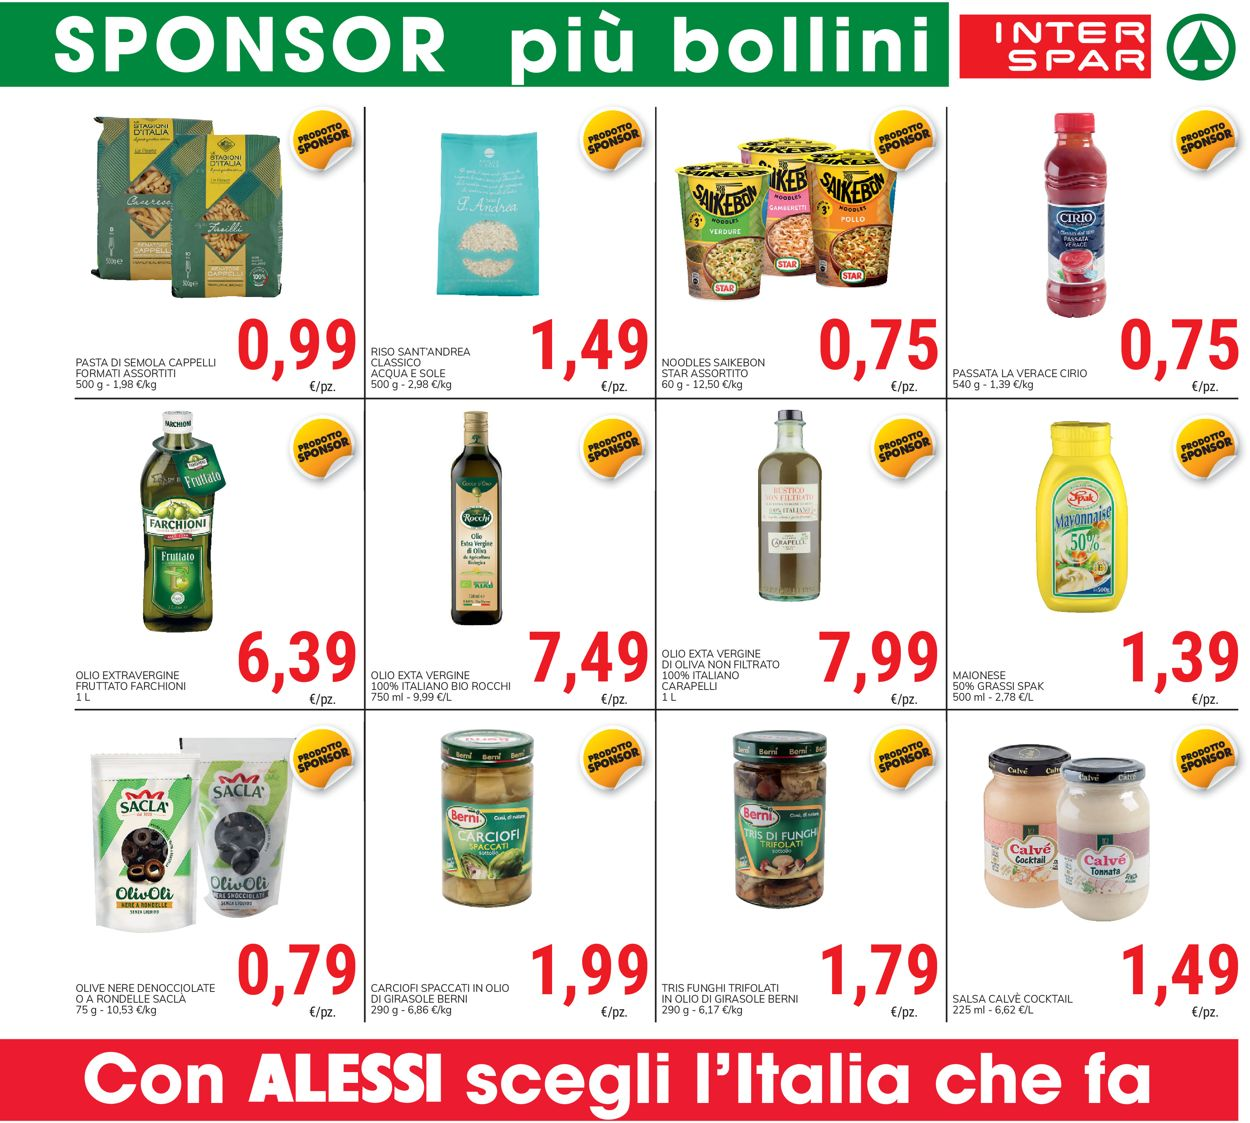 Volantino Interspar - Offerte 27/05-13/06/2021 (Pagina 7)